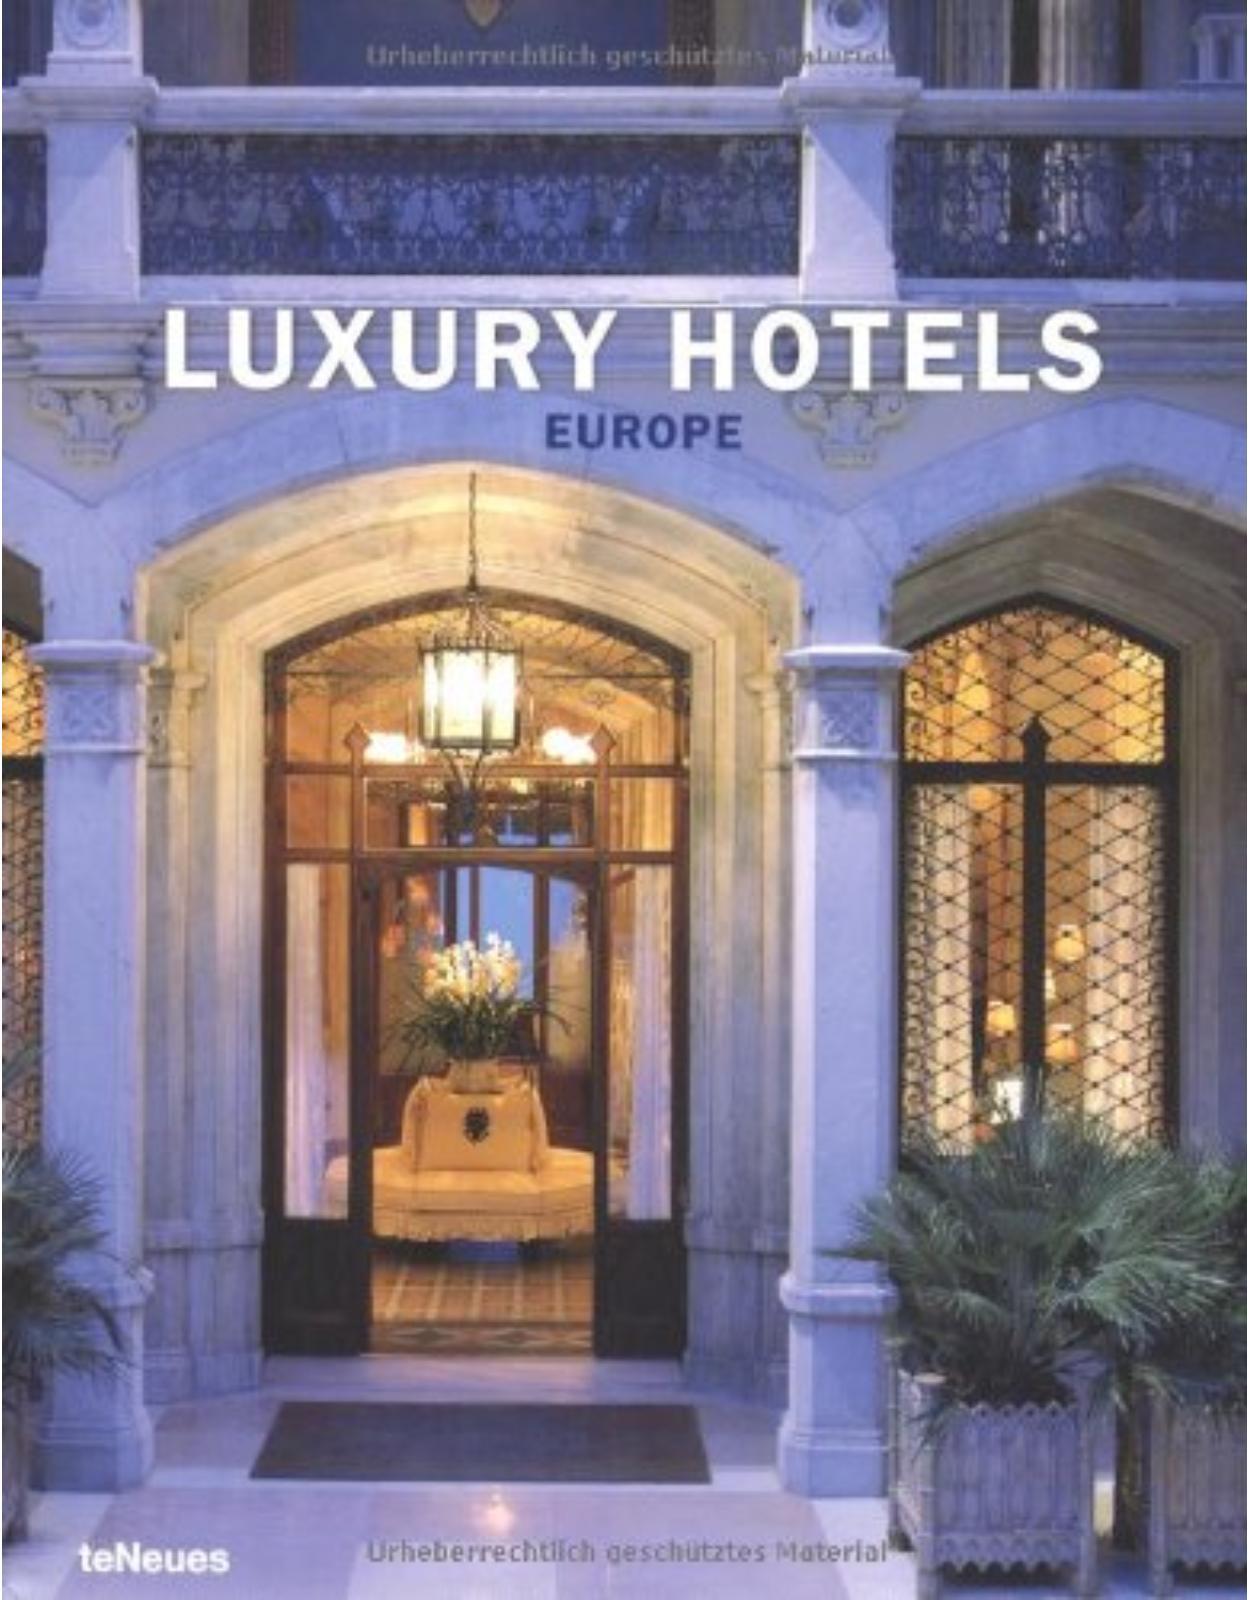 Luxury Hotels Europe